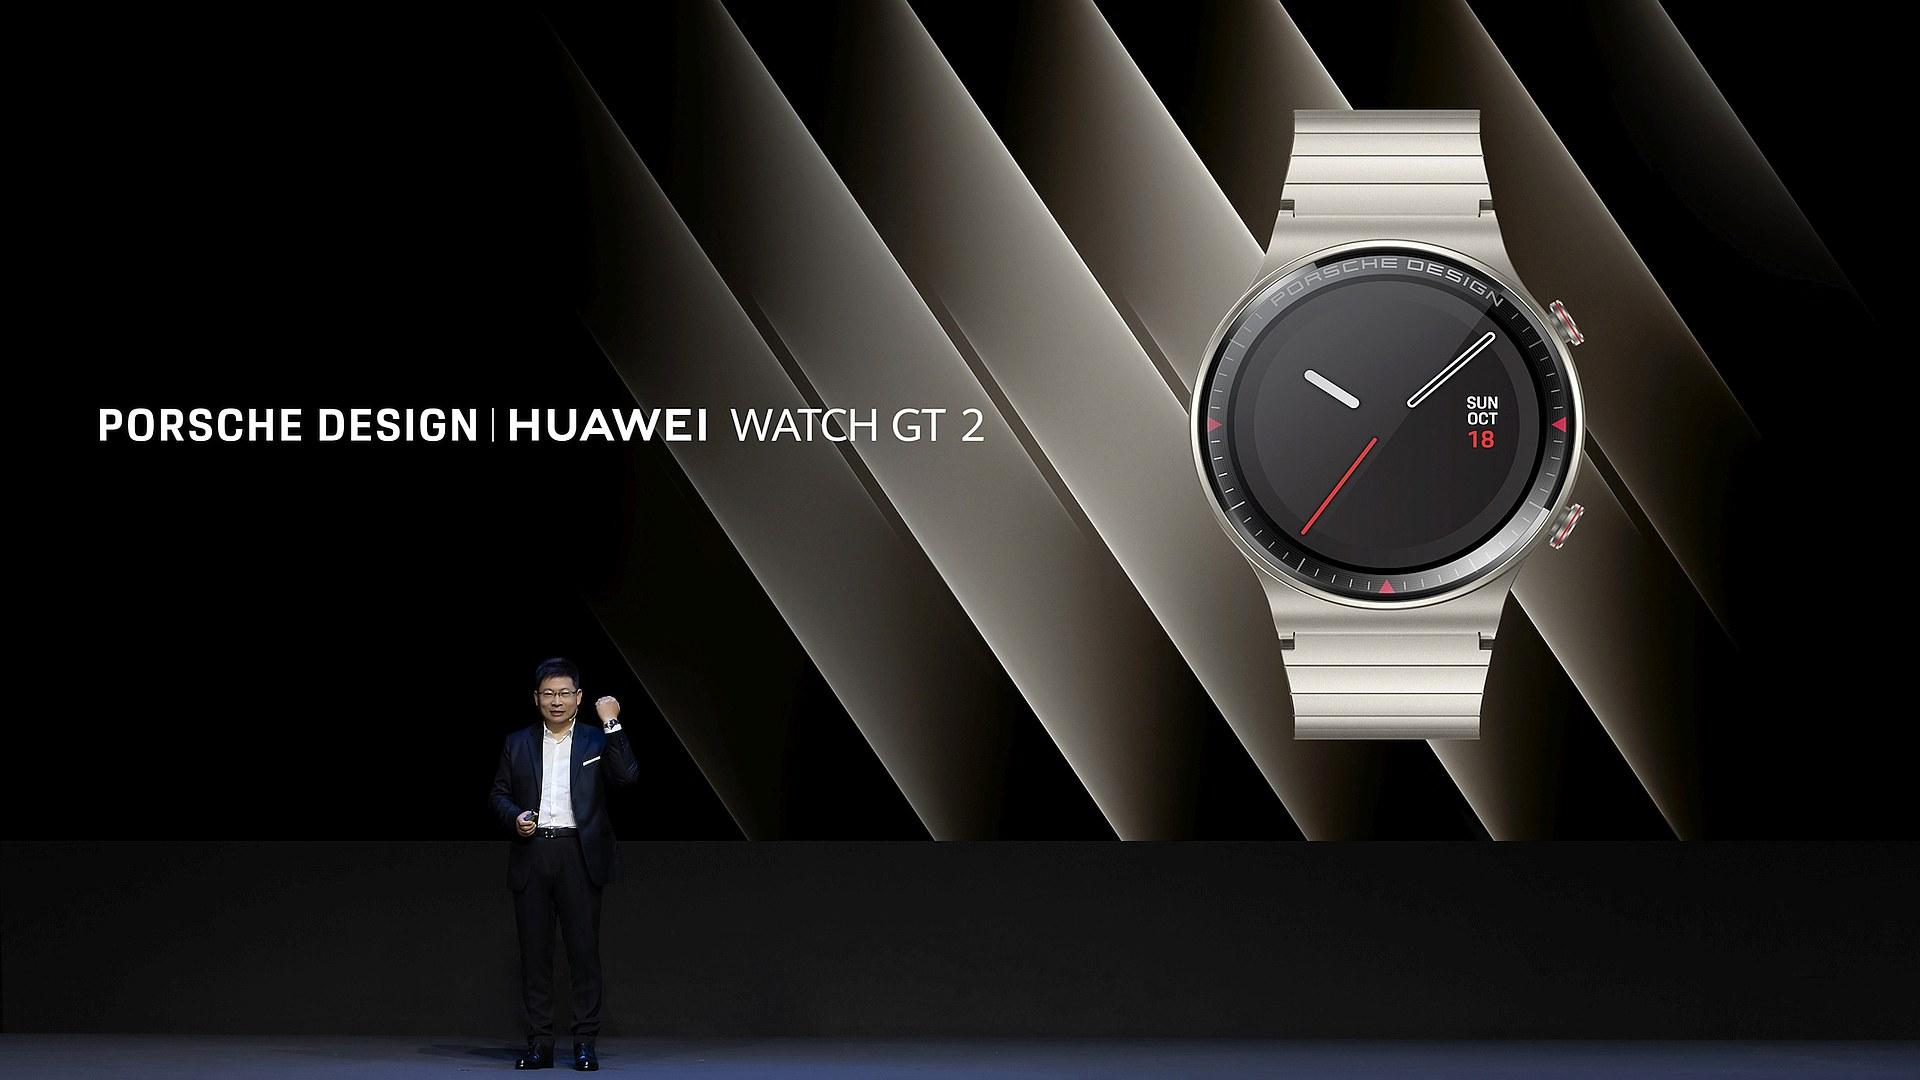 Porsche Desing Huawei Watch GT 2 1 1